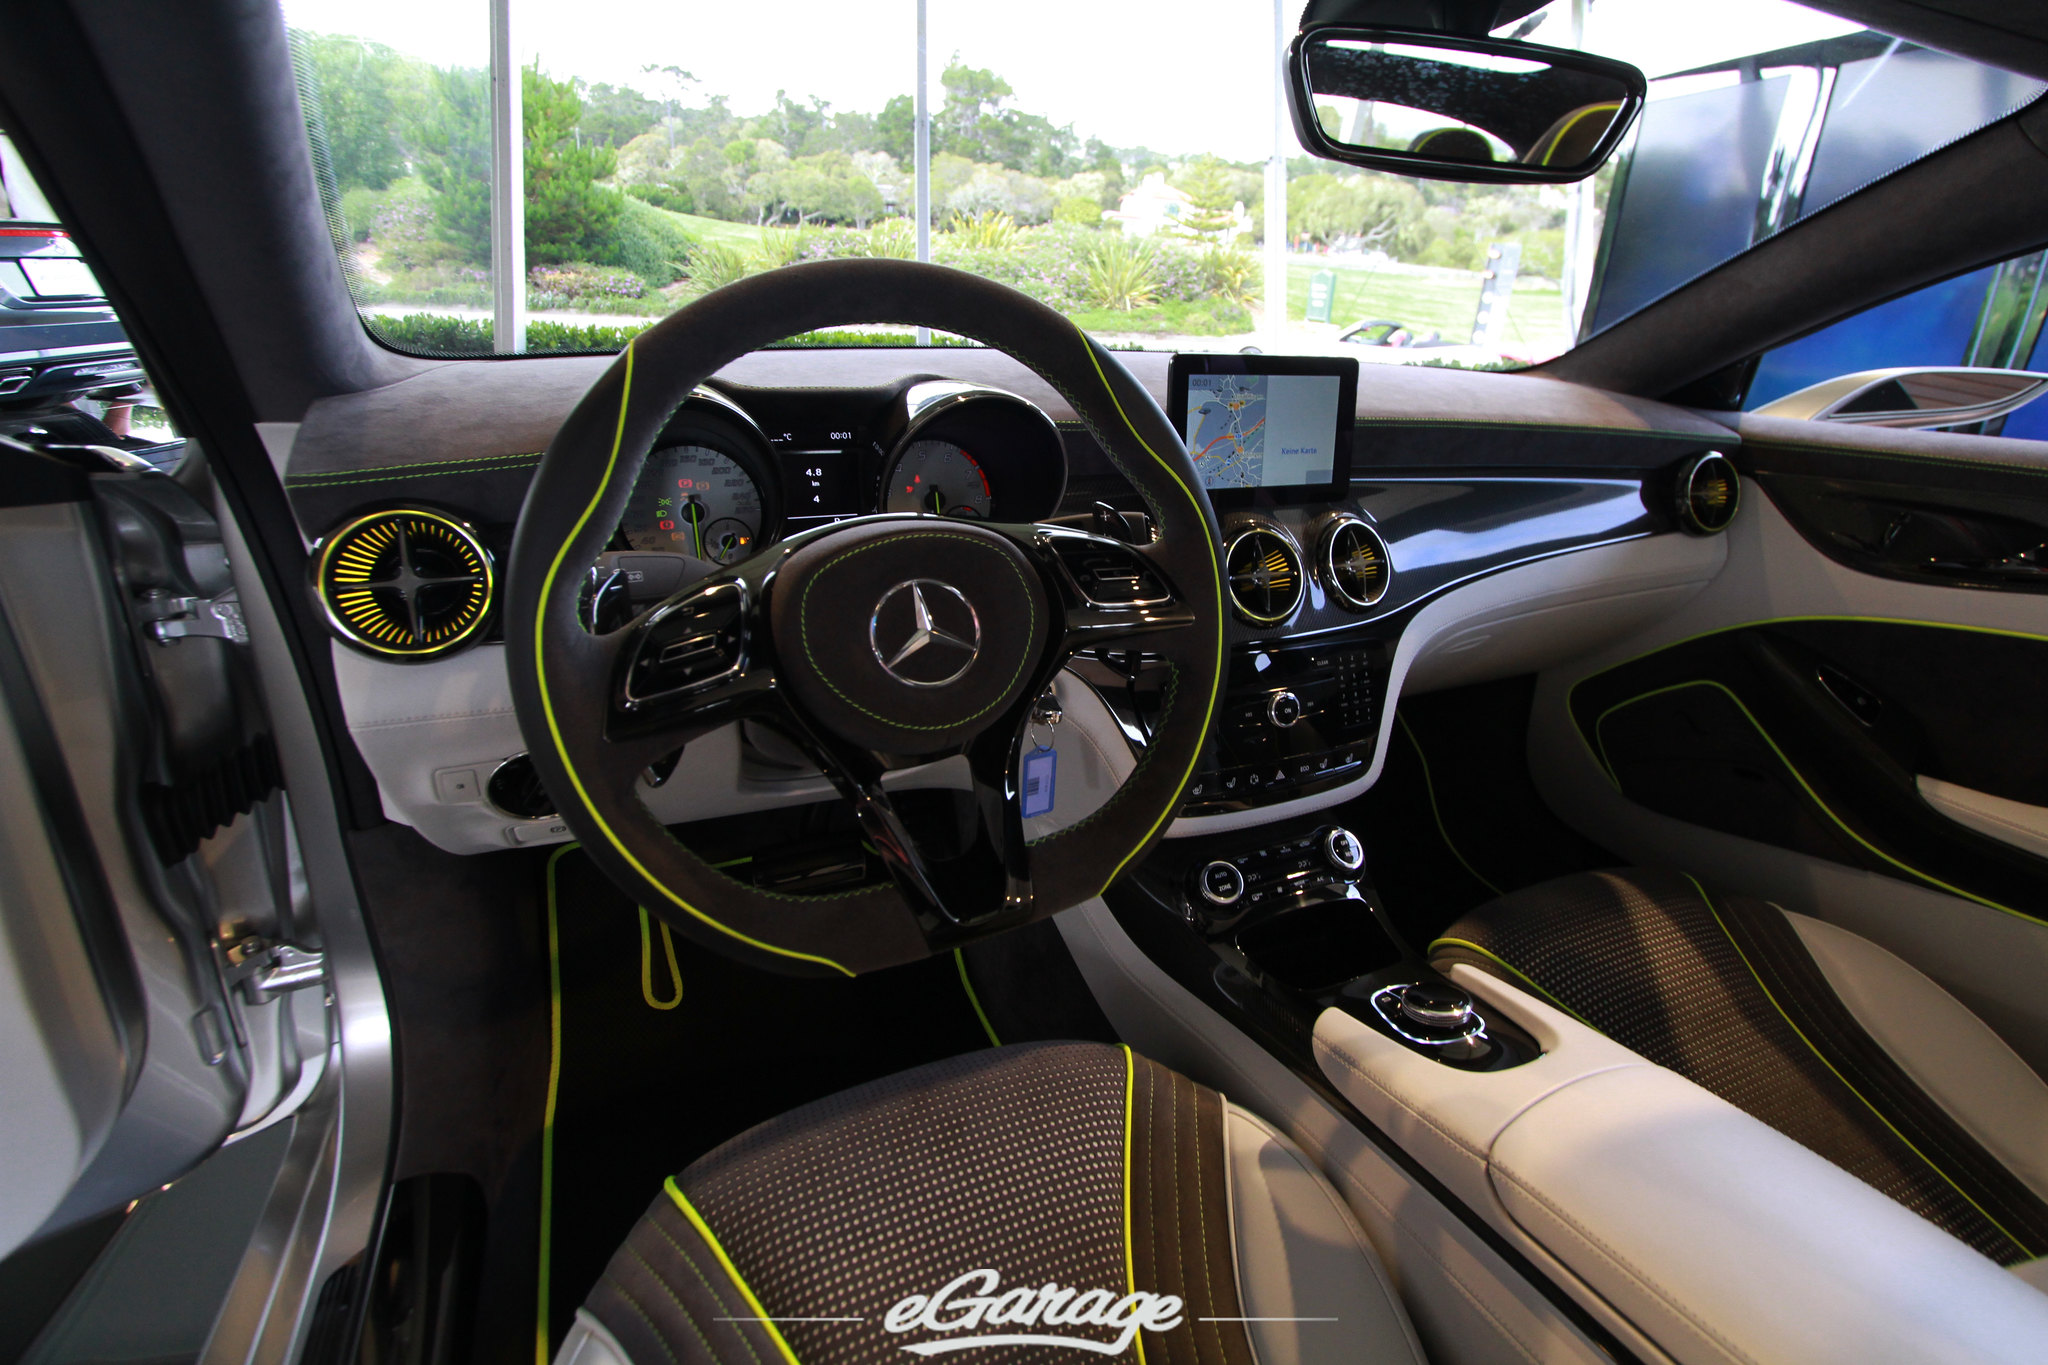 7828956424 b43bfc02ef k Mercedes Benz Classic